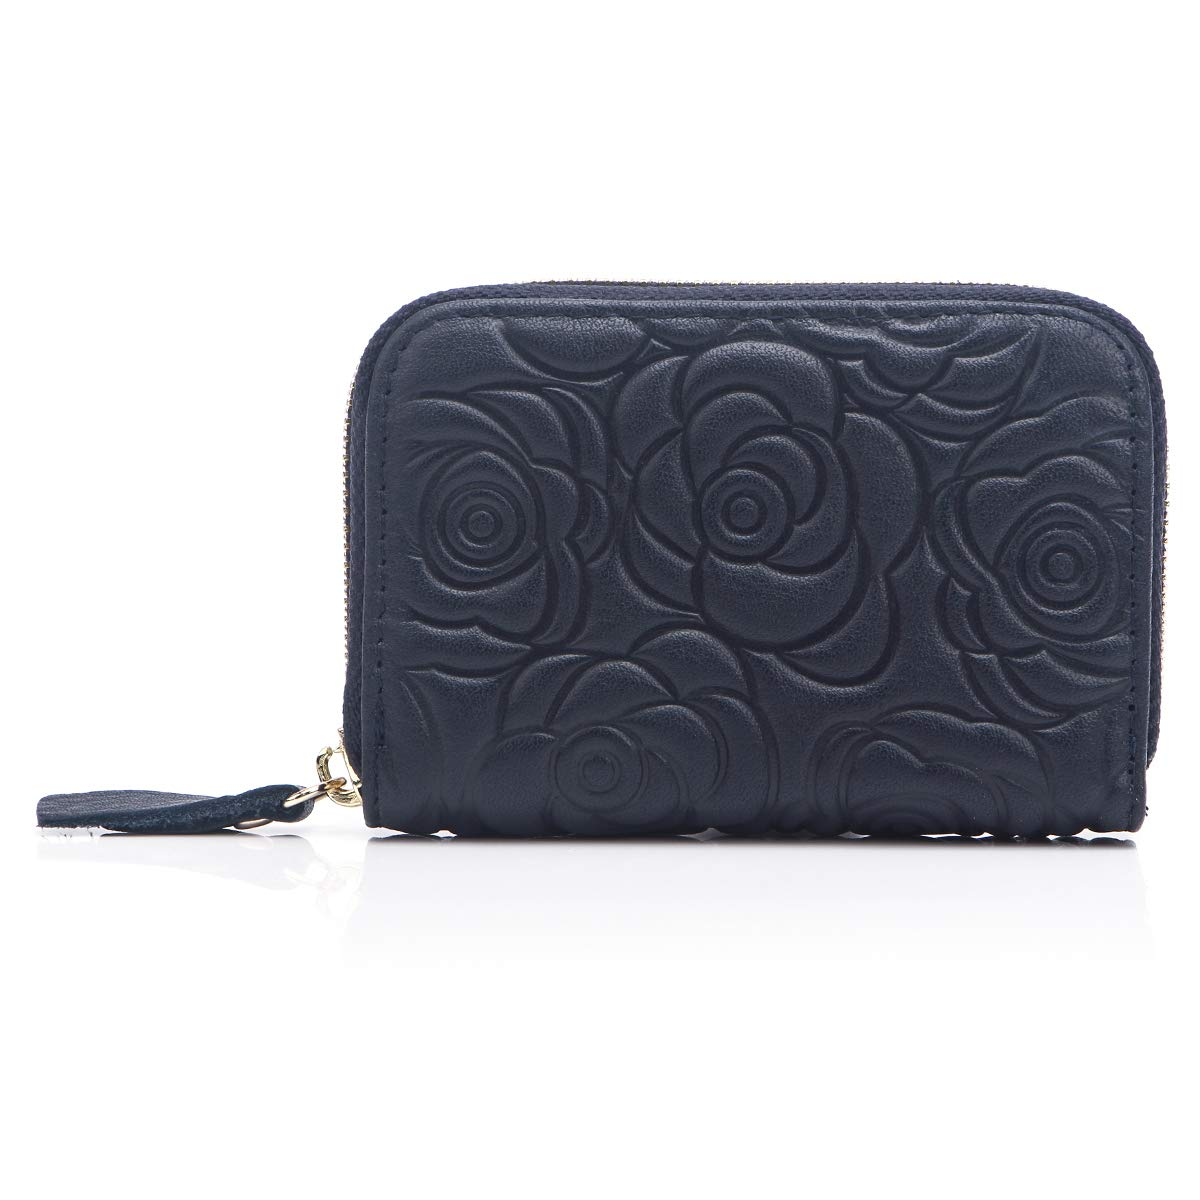 APHISONUK Women RFID Blocking Small Purse Leather Card Wallet Ladies Credit Card Holder Mini Travel Wallet for Girls(Black)/Gift Box 333R7110BLACK